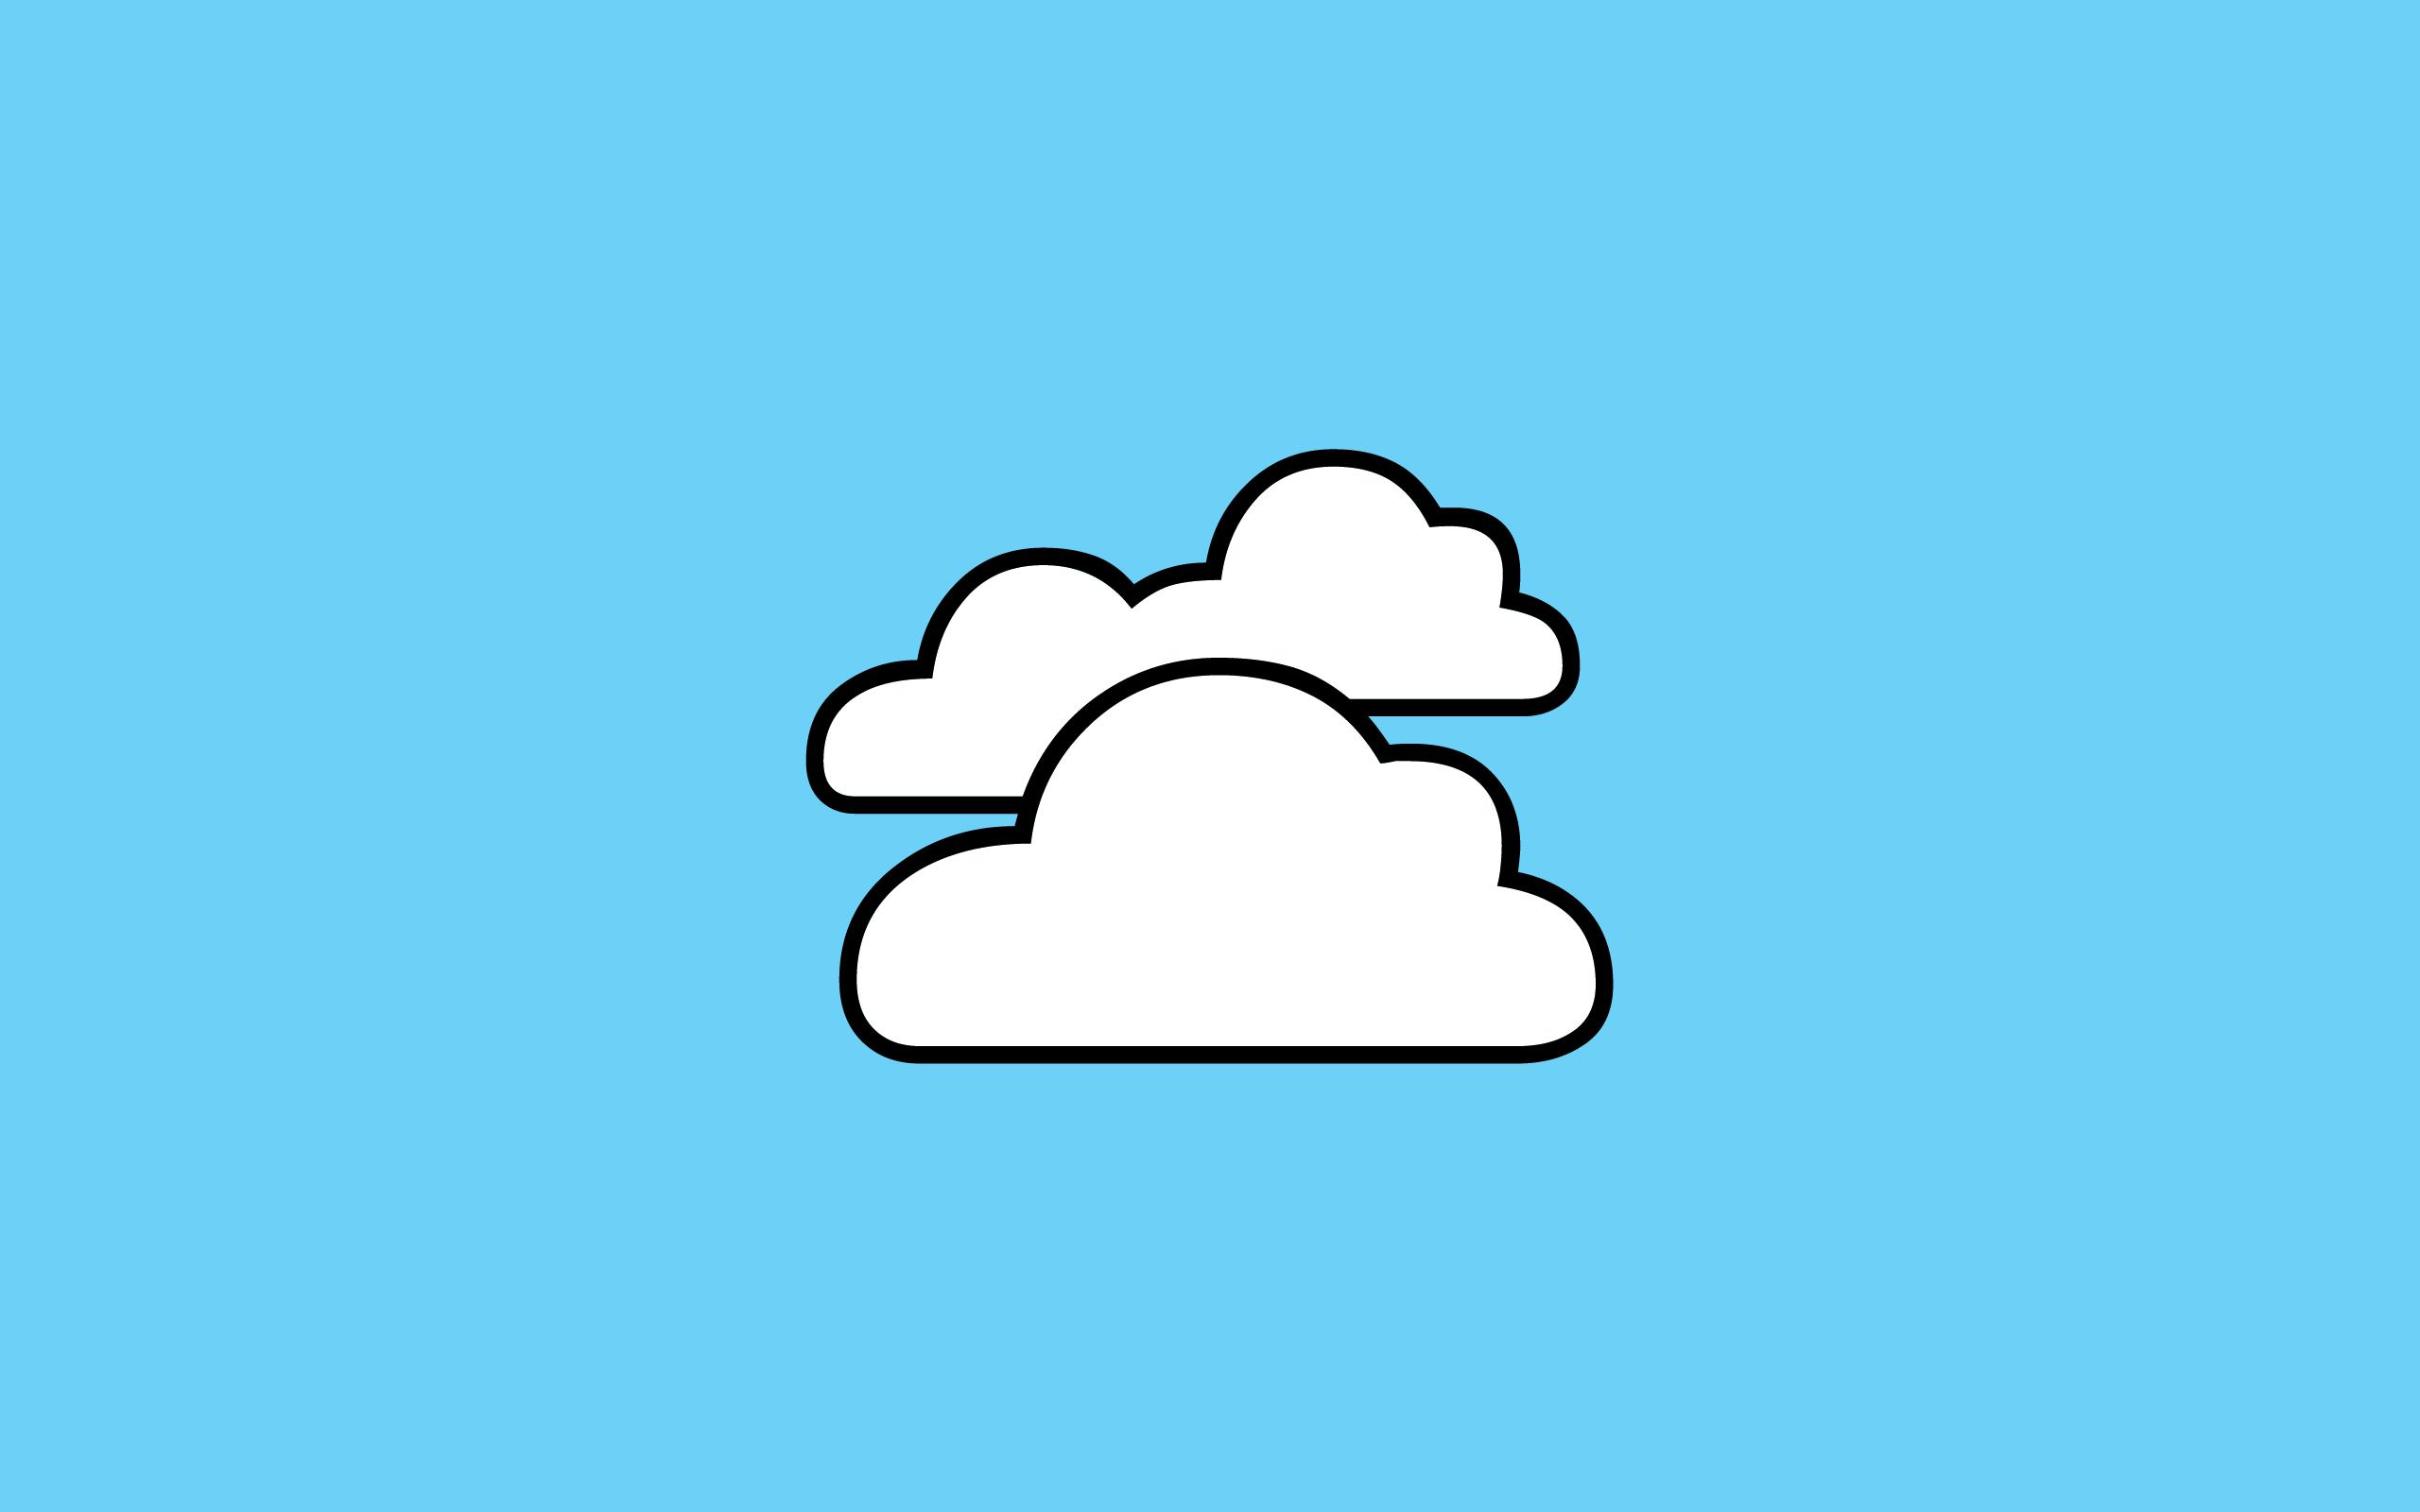 Clouds by brianlechthaler